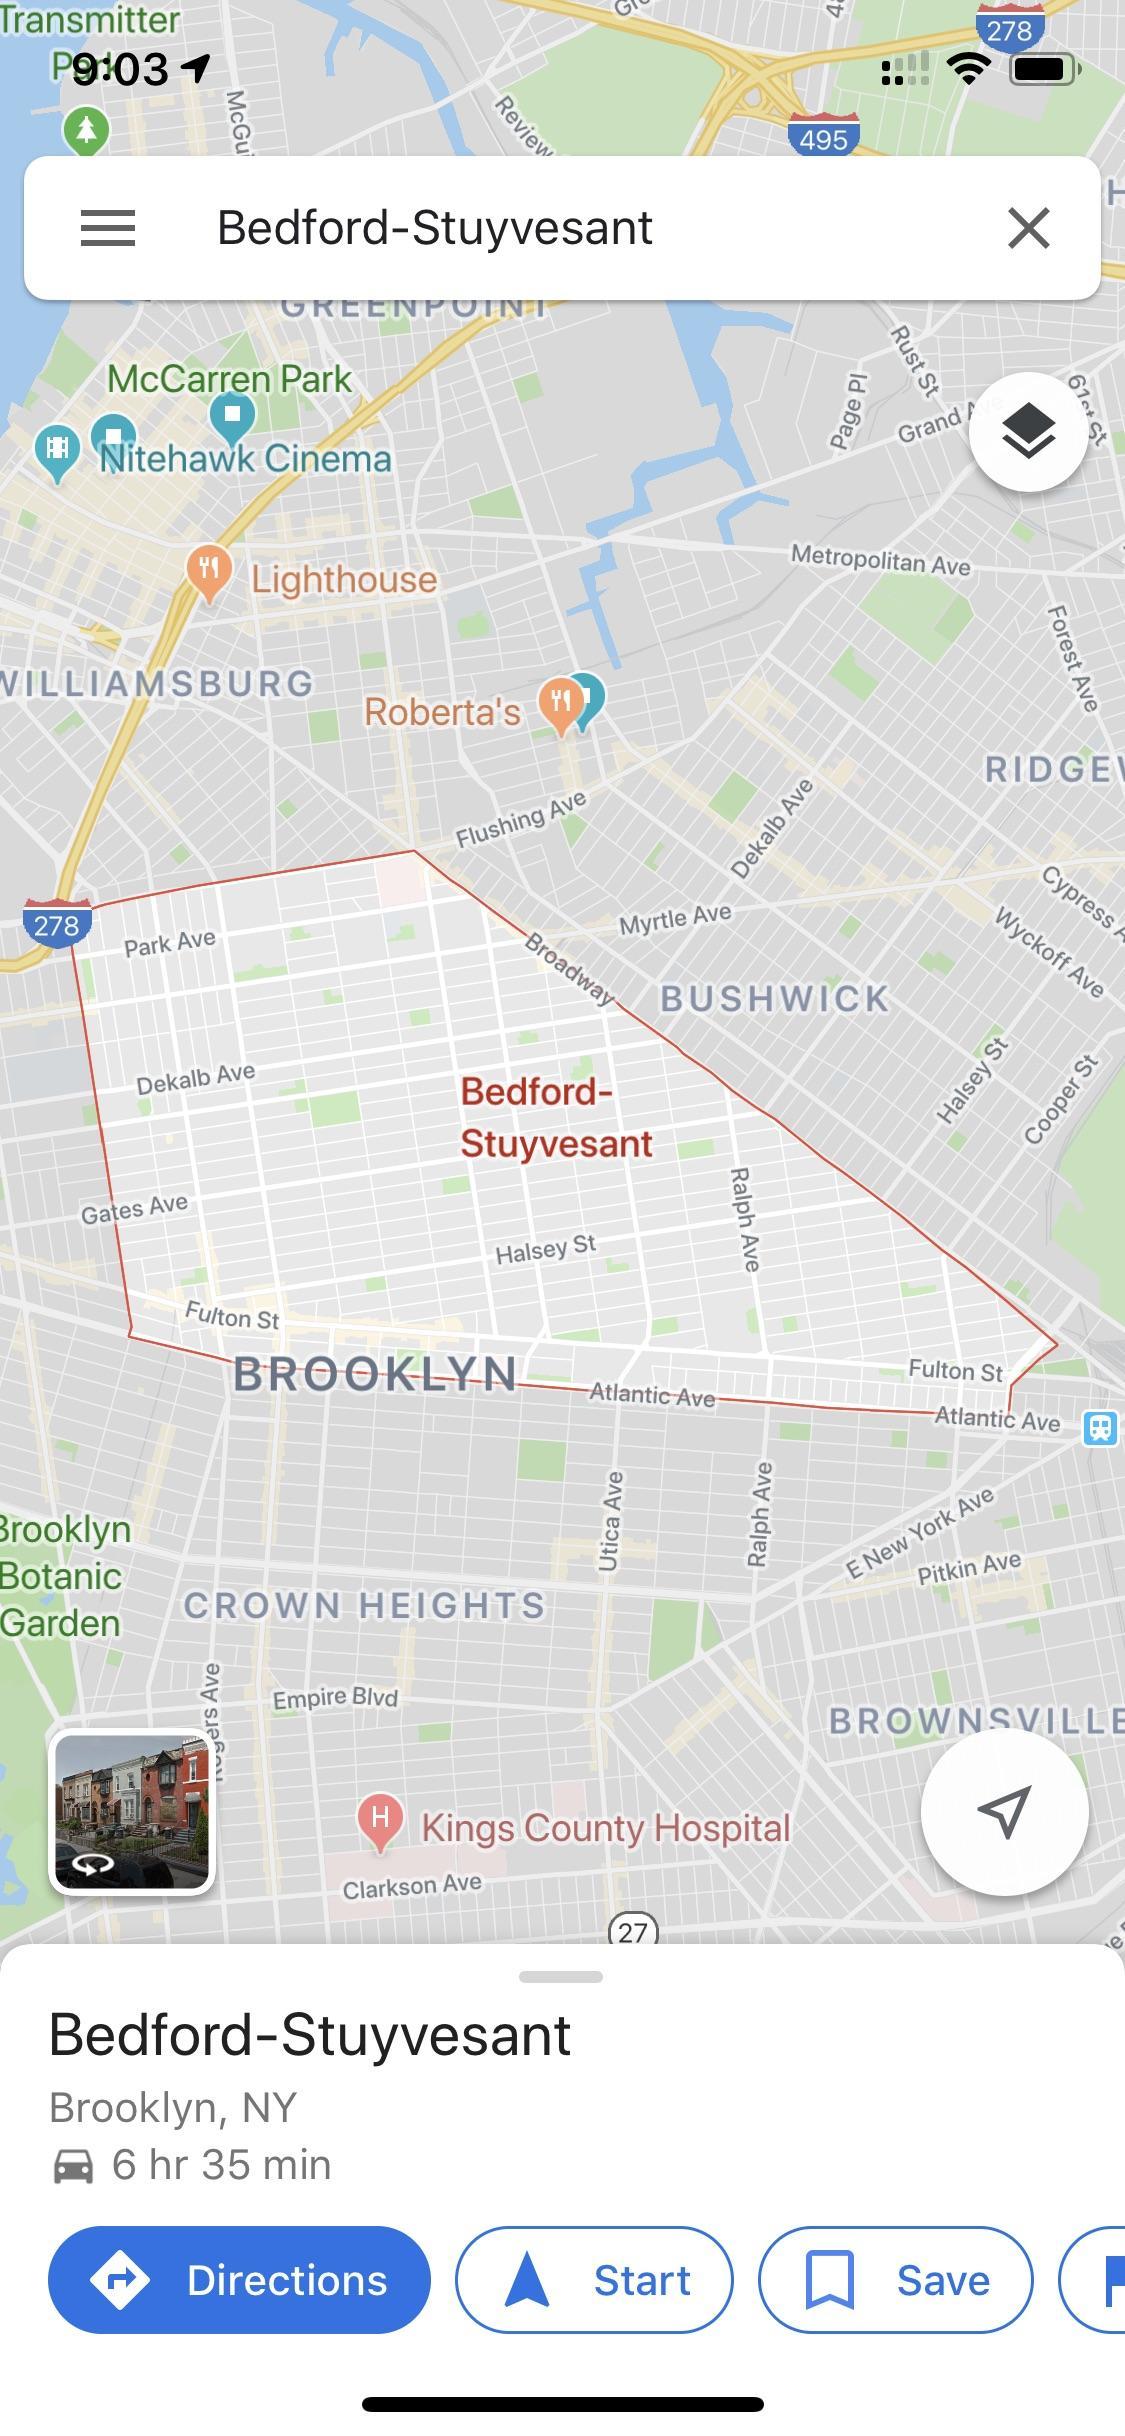 Google Maps Zip Codes Overlay : google, codes, overlay, FINALLY!, Google, Shows, Boundaries, Selected, Region,, Neighborhood,, City,, GoogleMaps